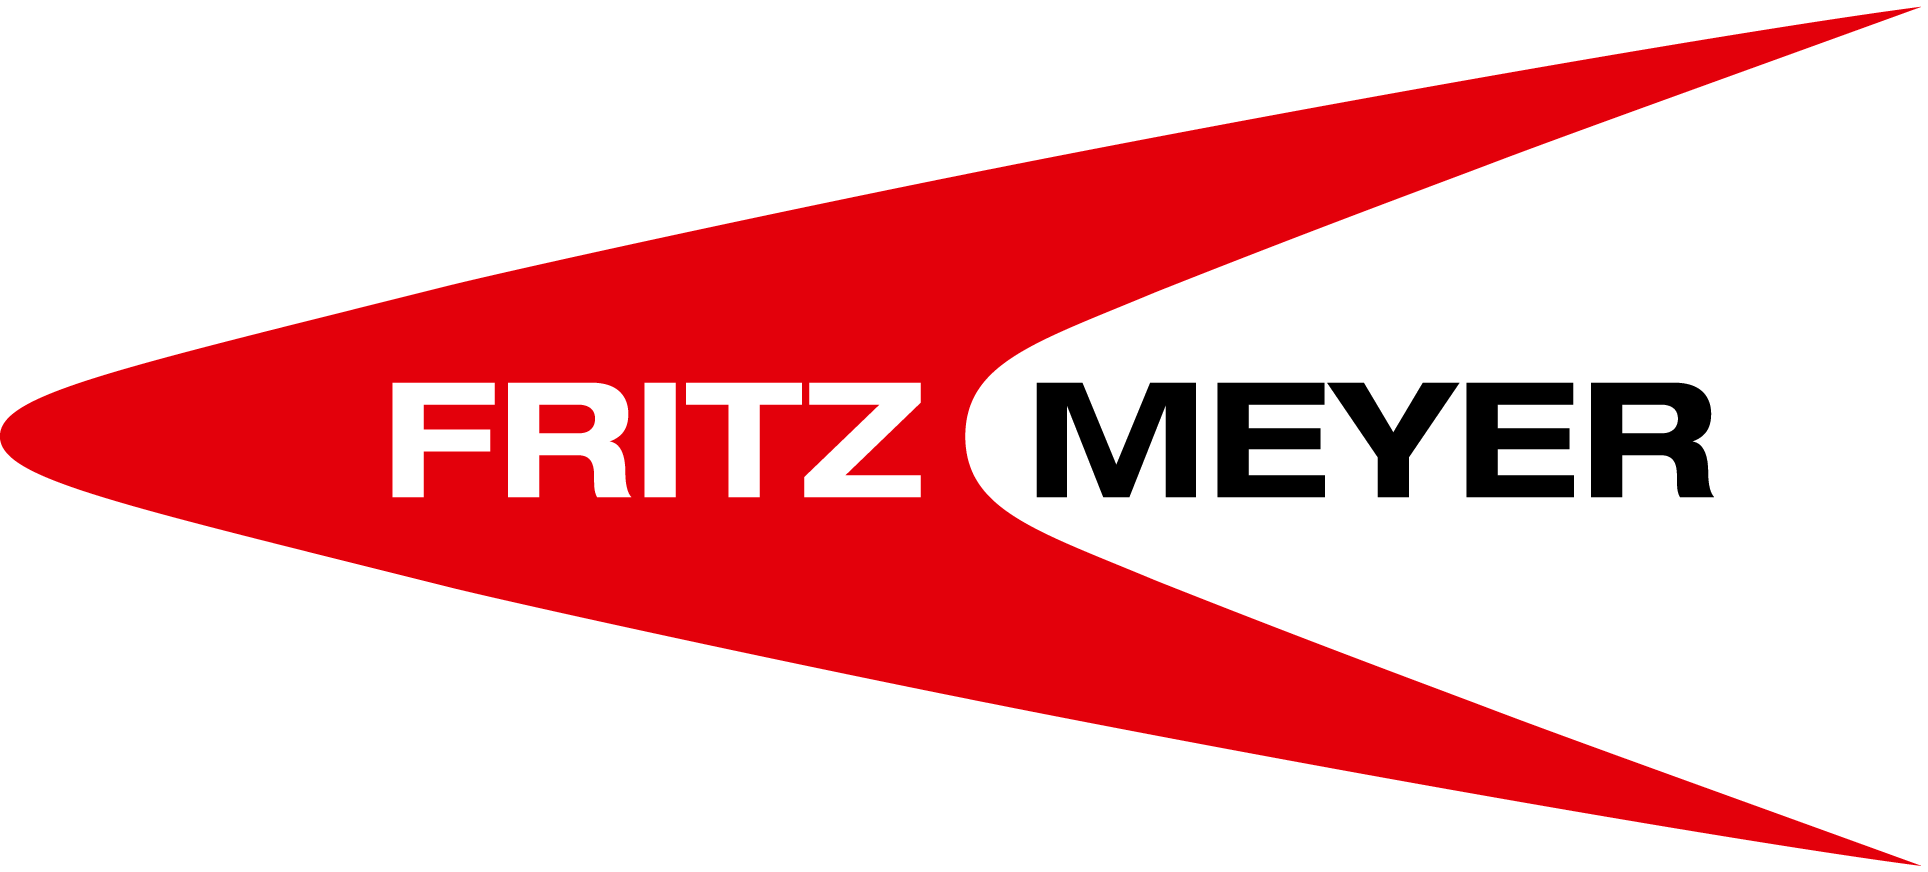 Fritz Meyer AG: Neues Partnerunternehmen